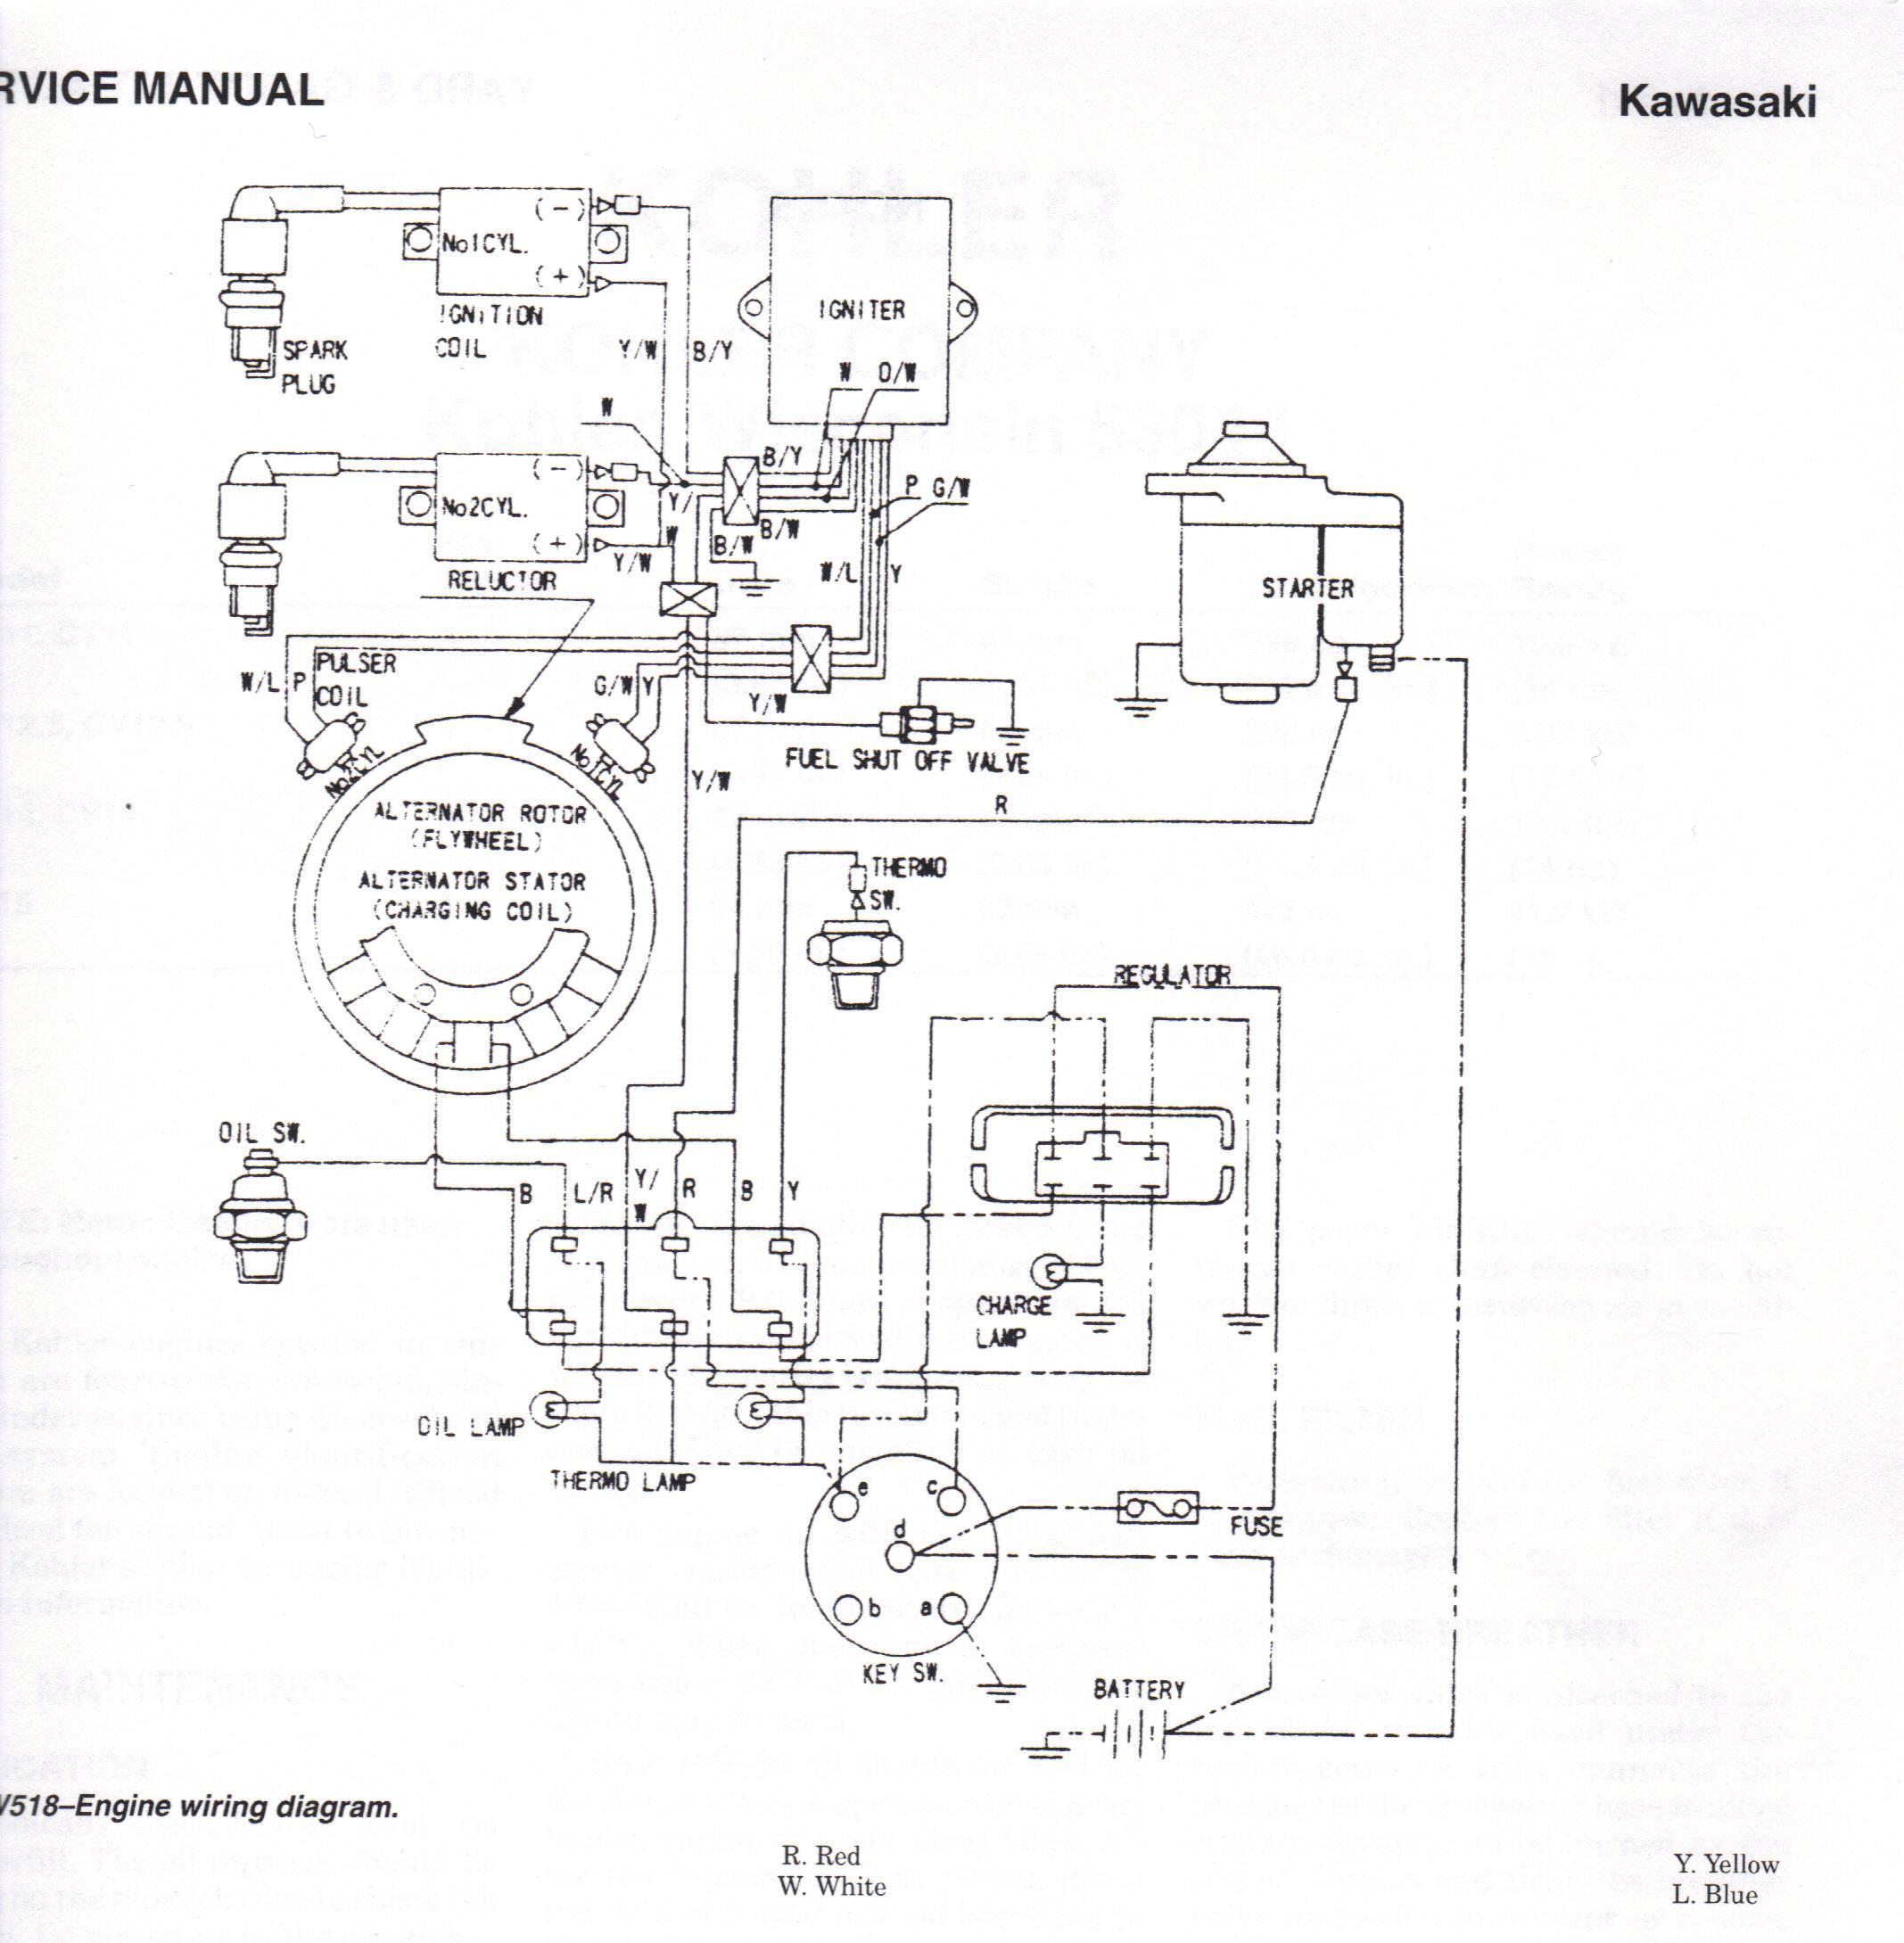 John Deere L120 Wiring Diagram - Lorestan - John Deere L120 Wiring Diagram